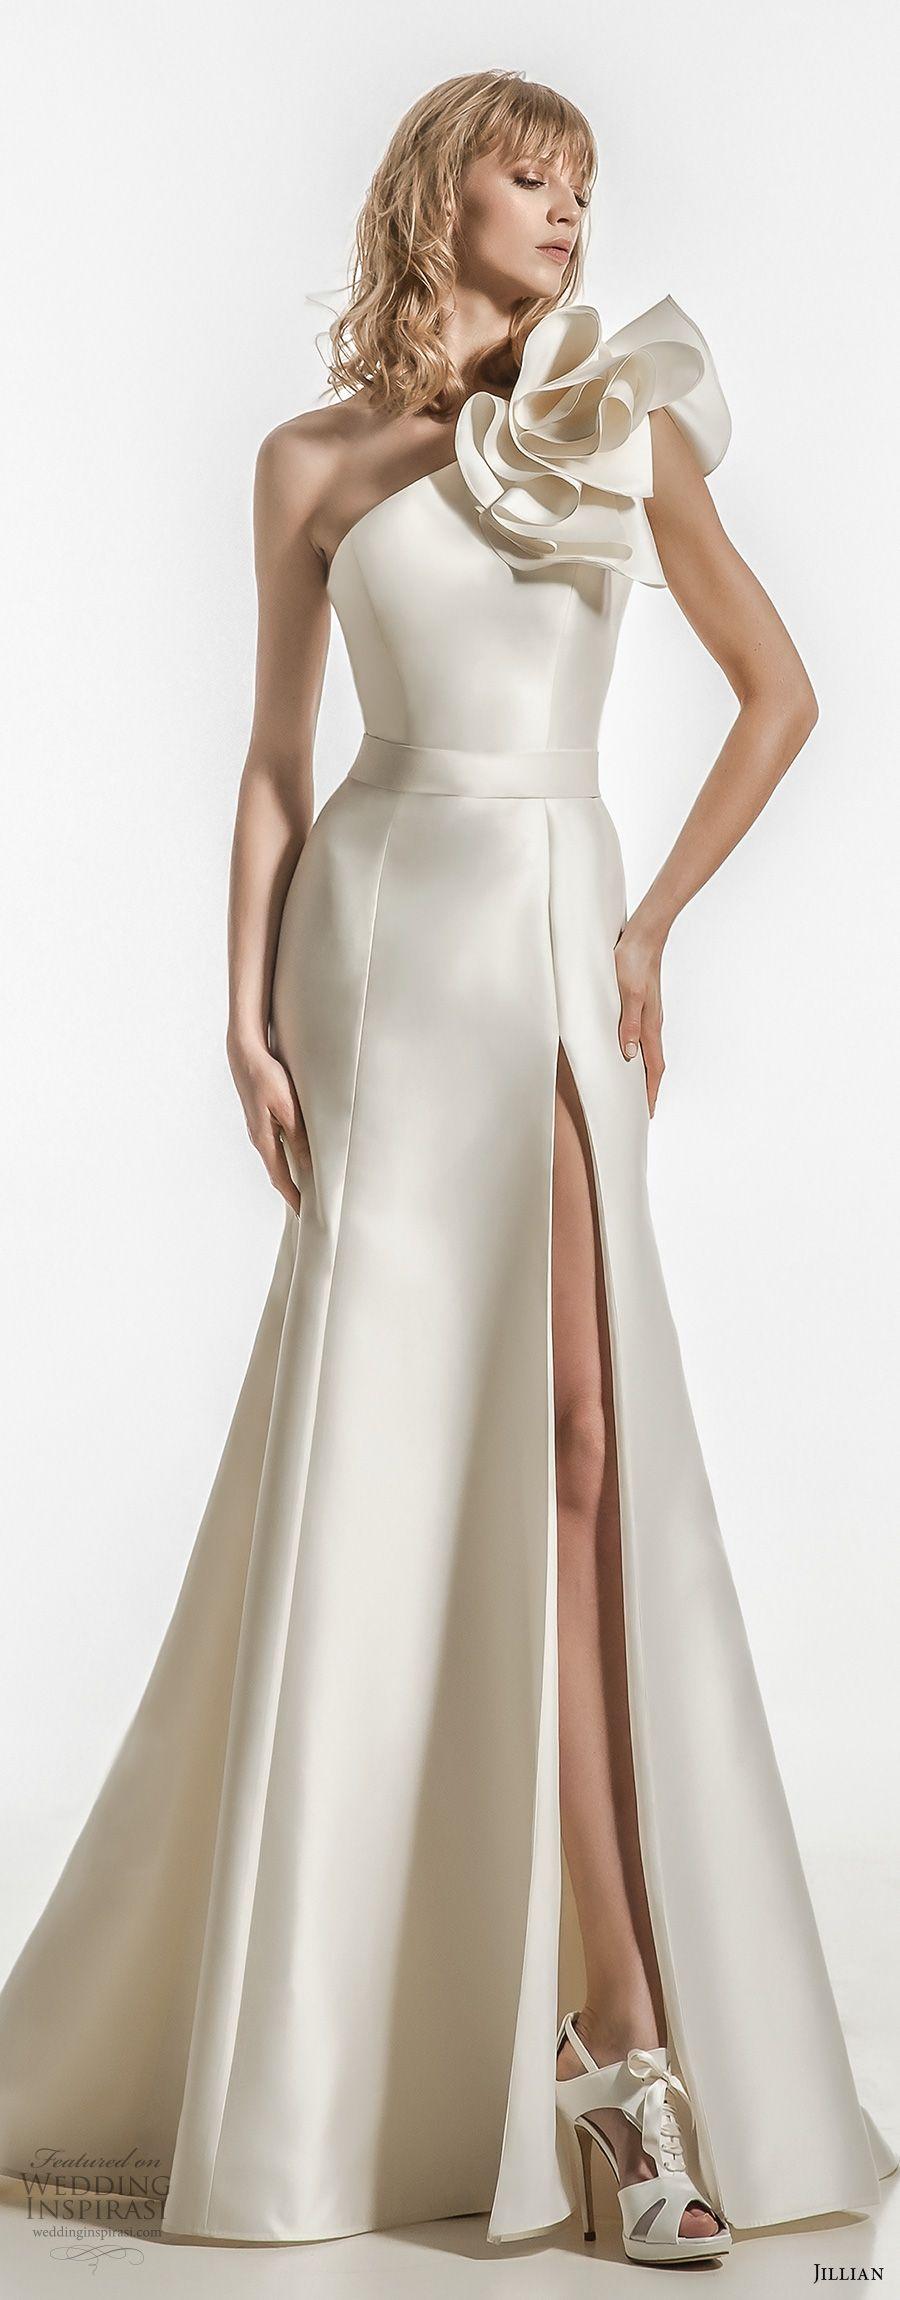 Jillian wedding dresses dress ideas pinterest vestidos